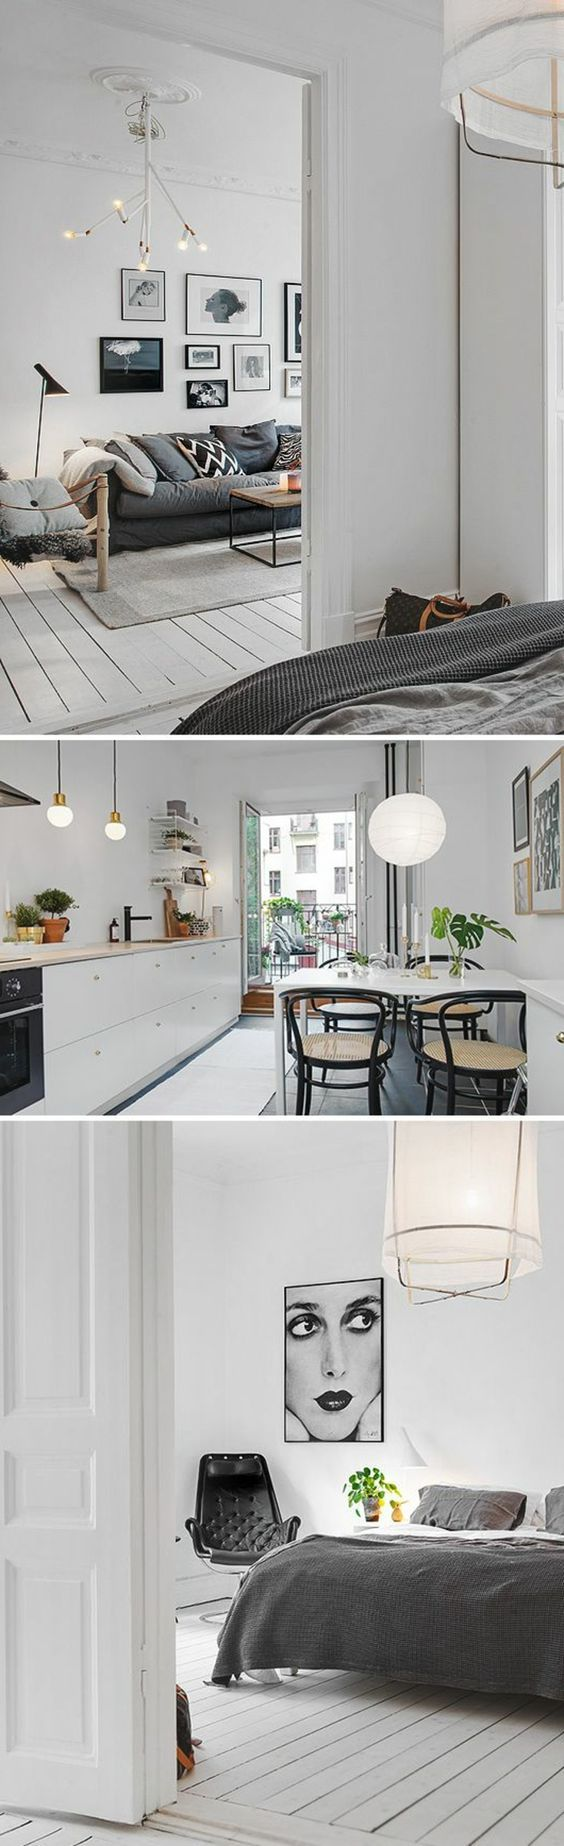 Principales 25 ideas incre bles sobre parquet blanchi en pinterest renovaci - Parquet blanchi scandinave ...